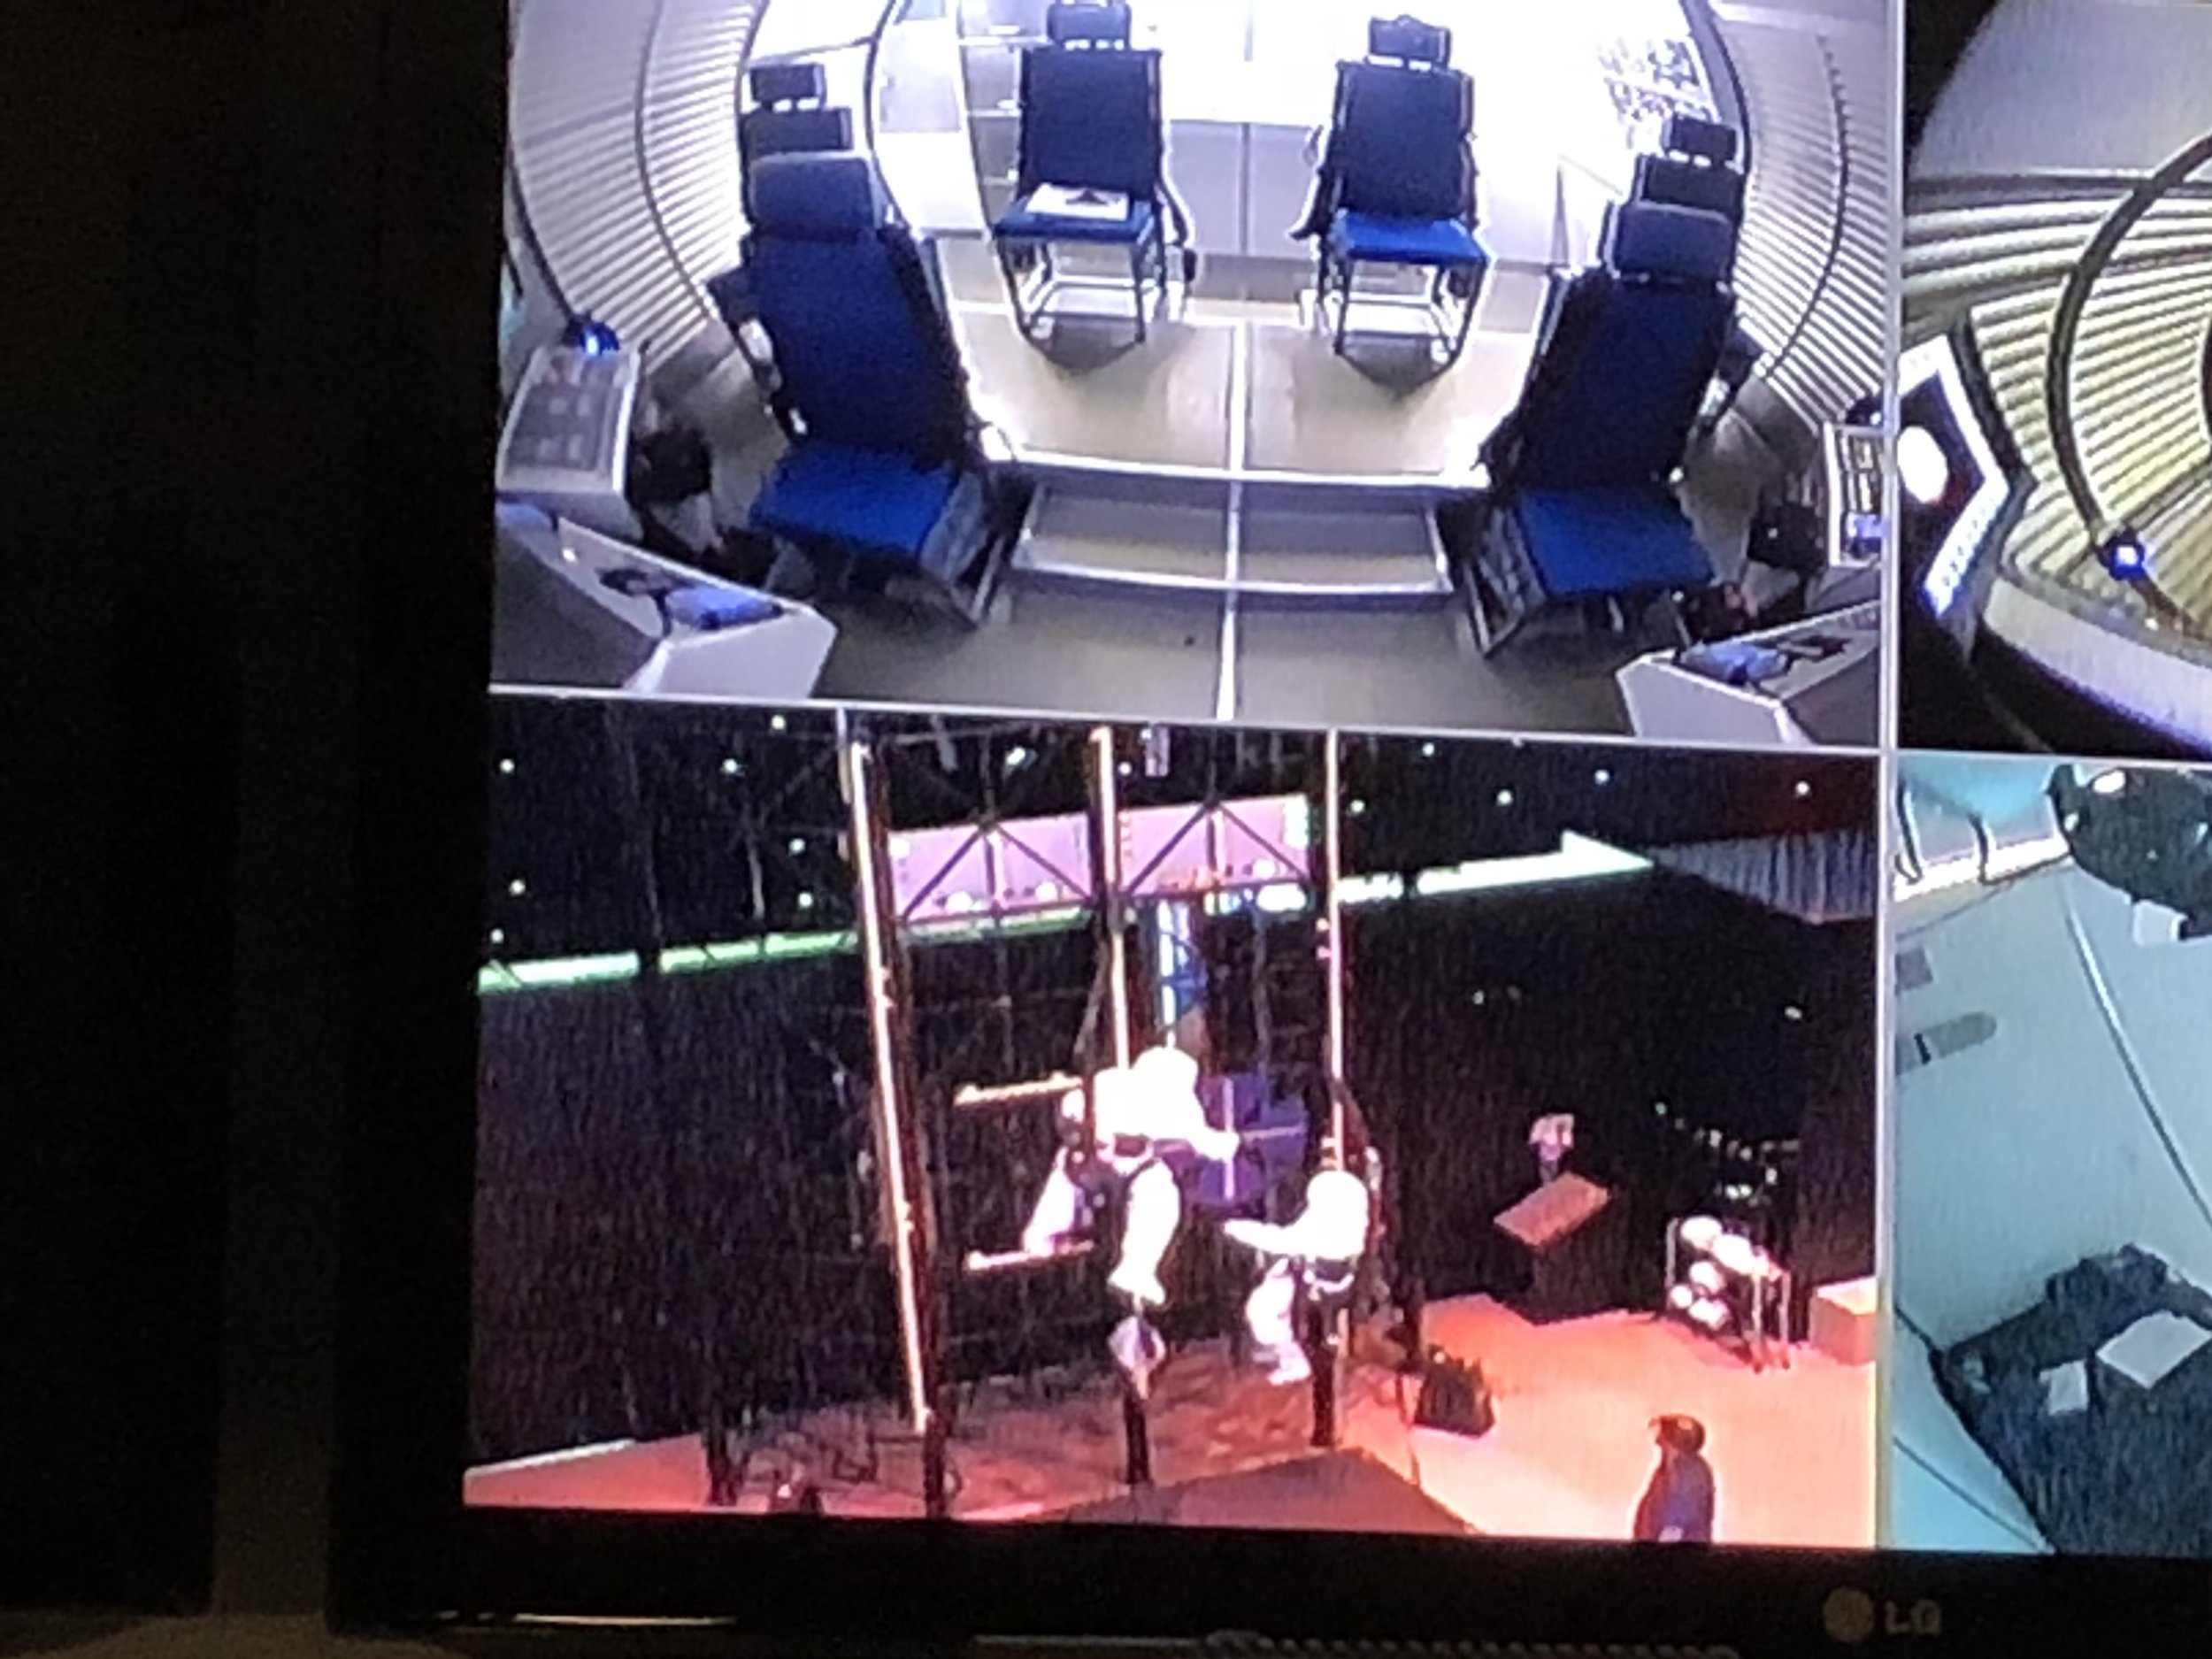 Mission Control Monitors 2.JPG